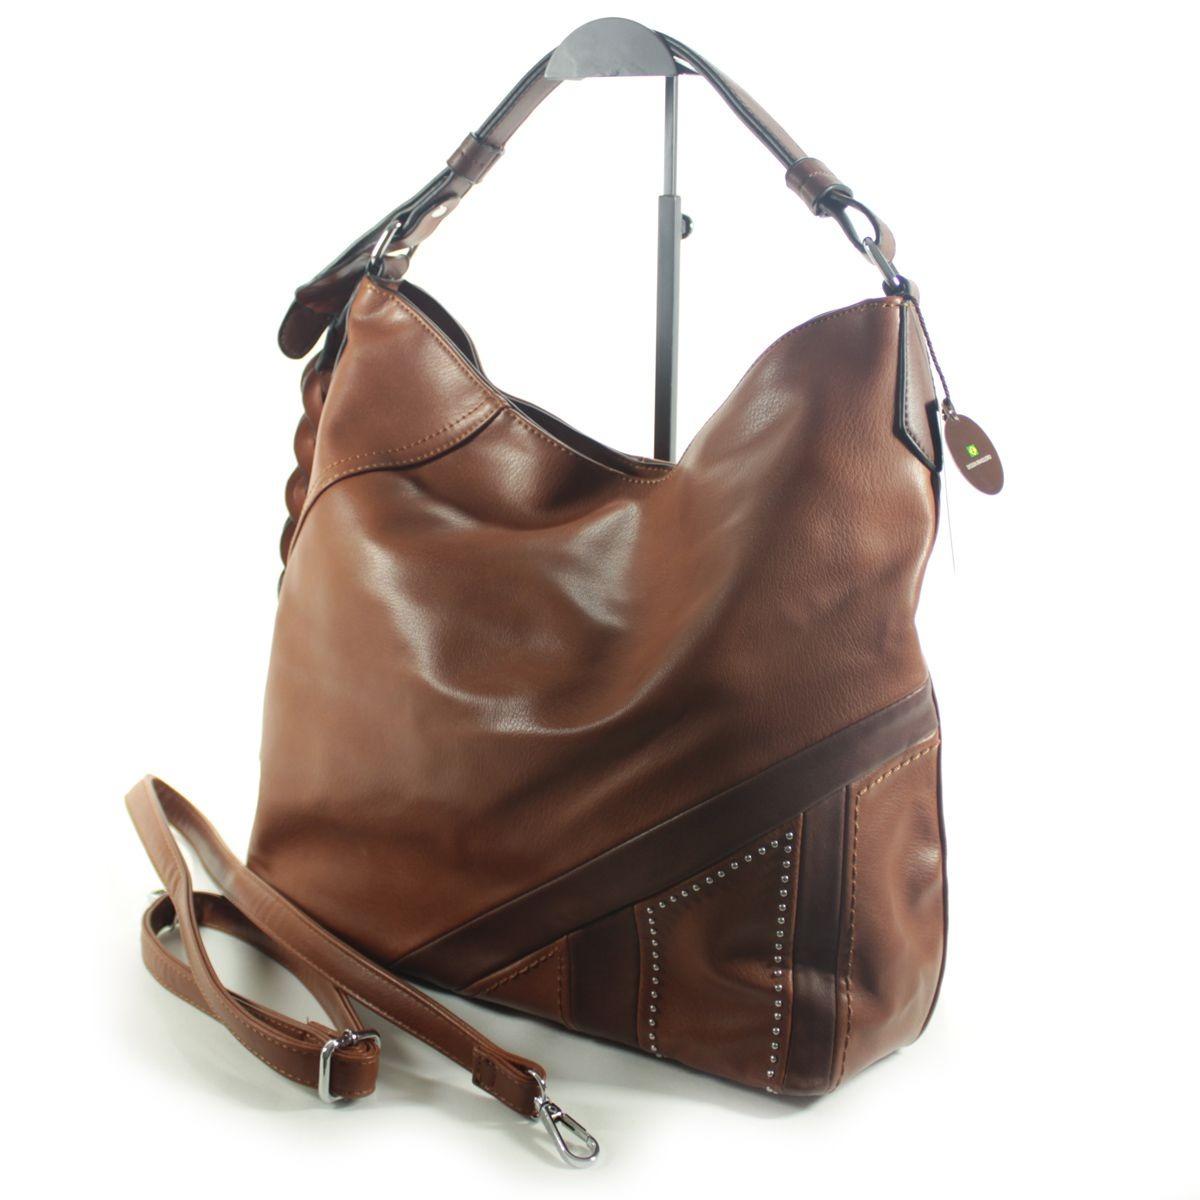 470d706cd bolsa feminina tiracolo transversal grande saco hobo nova. Carregando zoom.